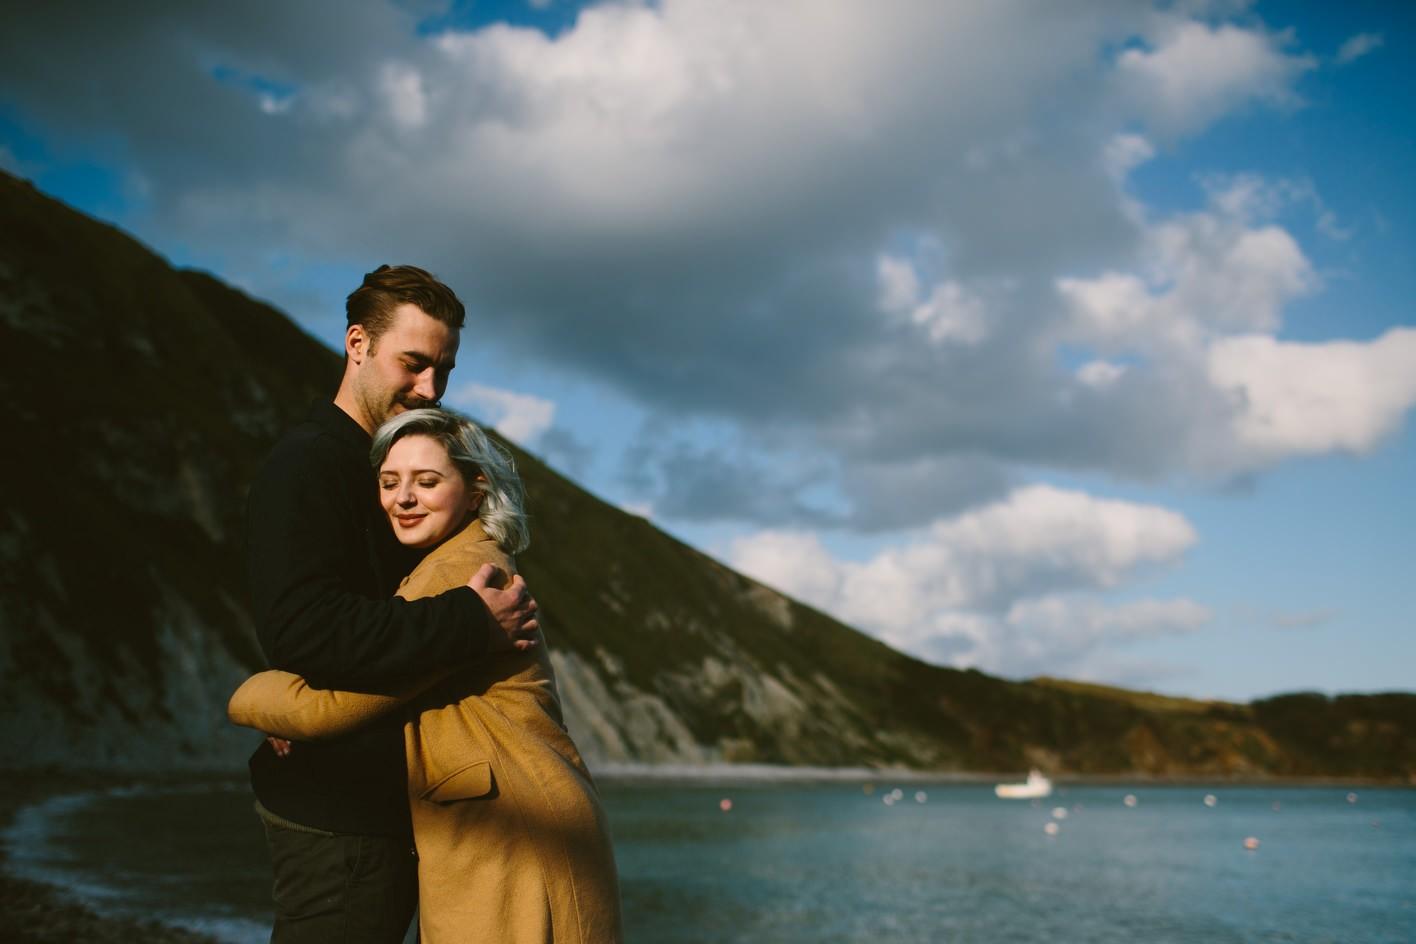 Lulworth Cove Engagement Shoot